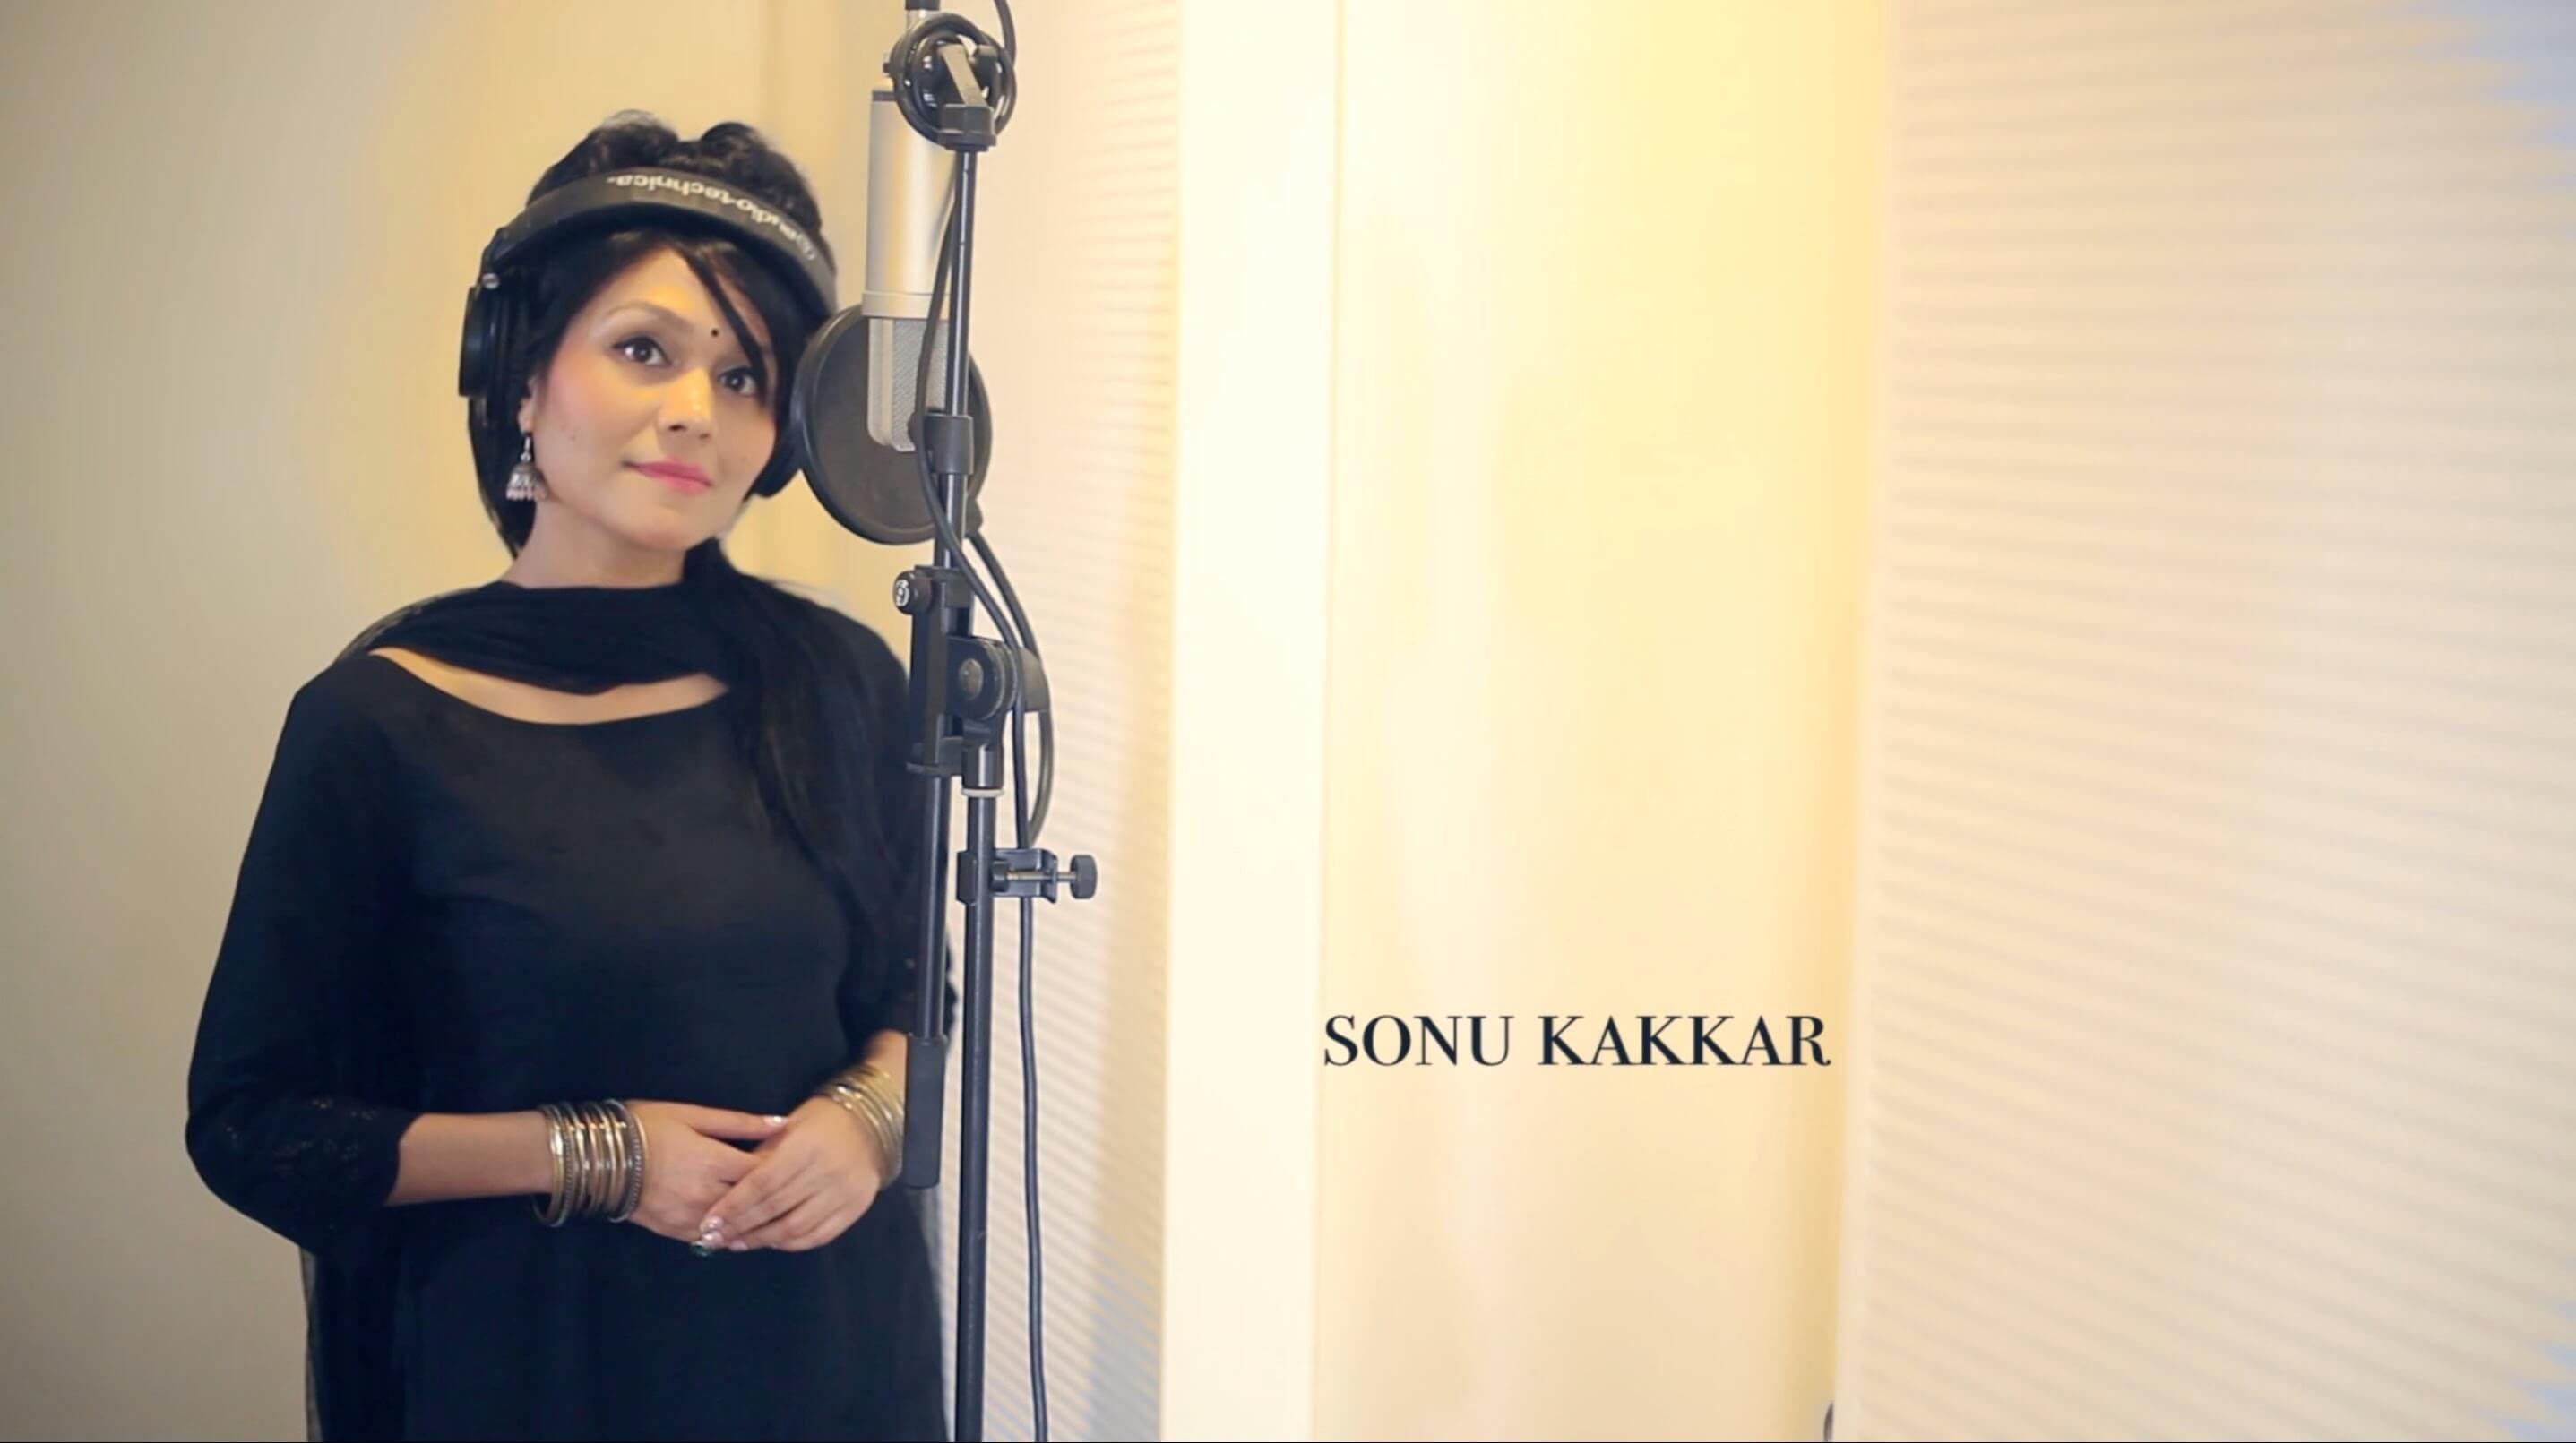 Sonu Kakkar Biography, Age, Weight, Height, Friend, Like